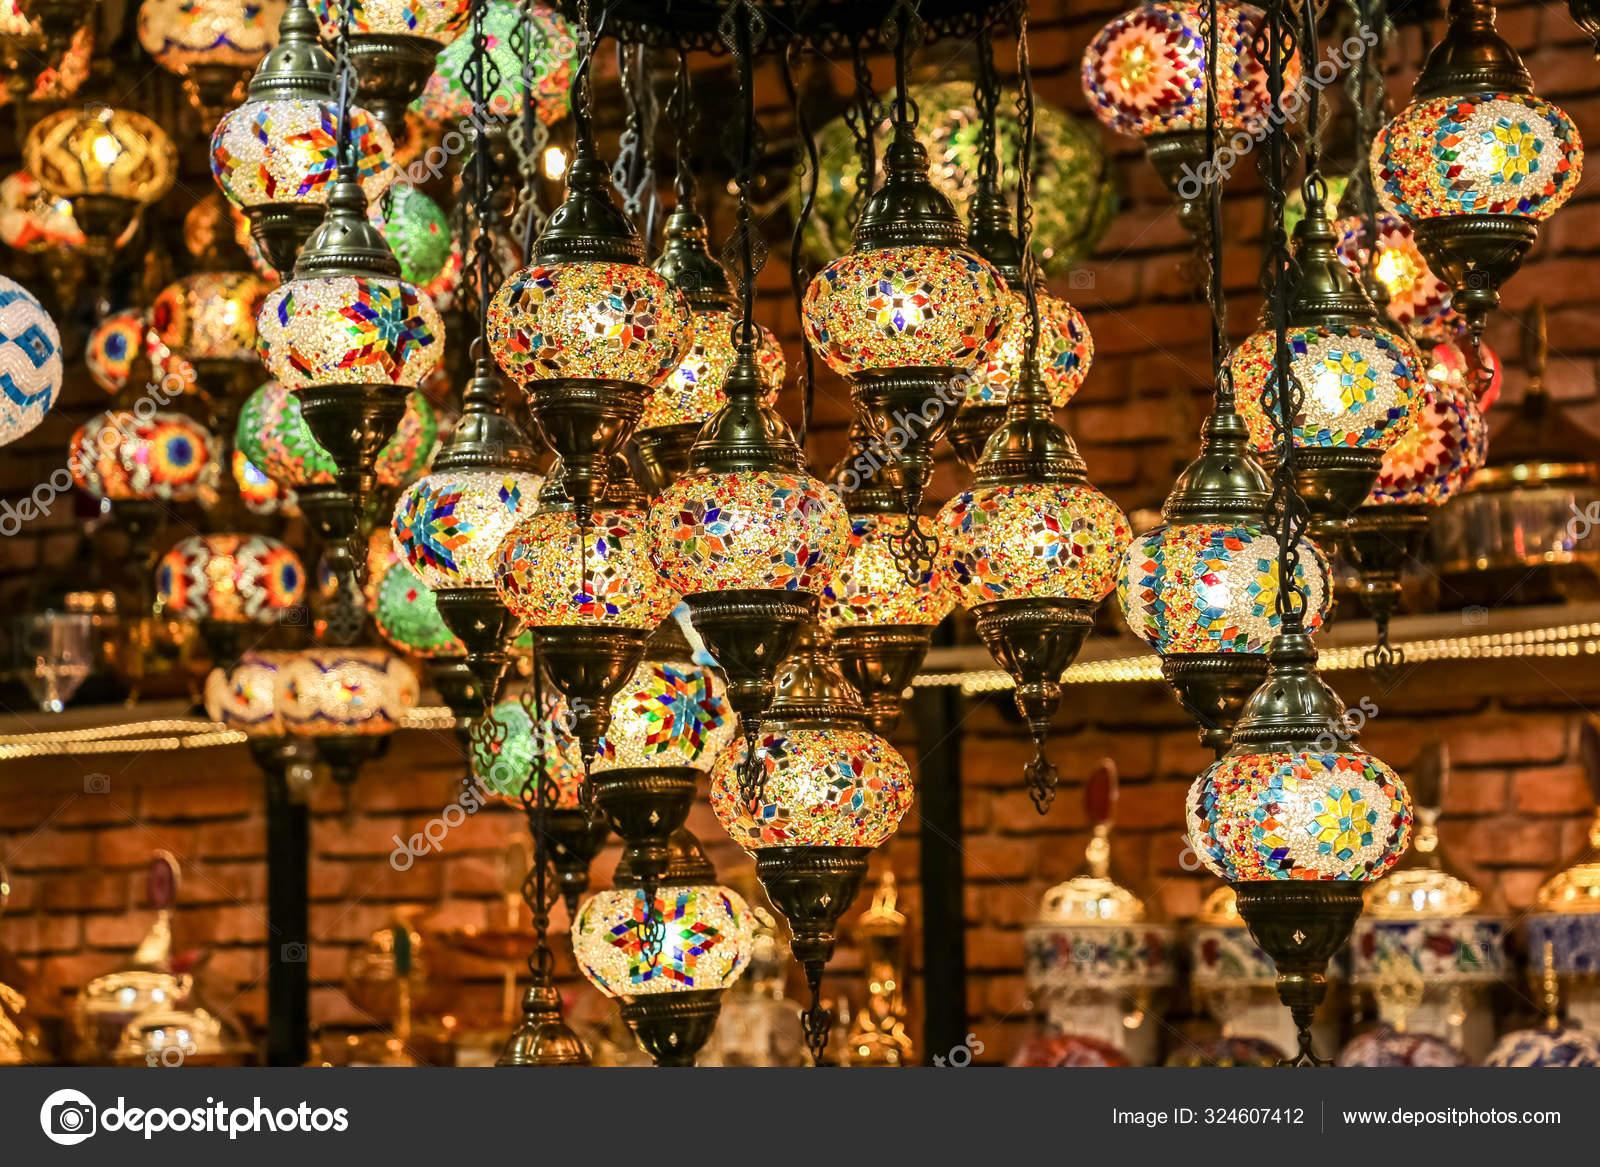 Decorative Turkish Lights Traditional Colourful Lights Hanging Lamps Istanbul Turkey Stock Photo C Clicksbyabrar 324607412